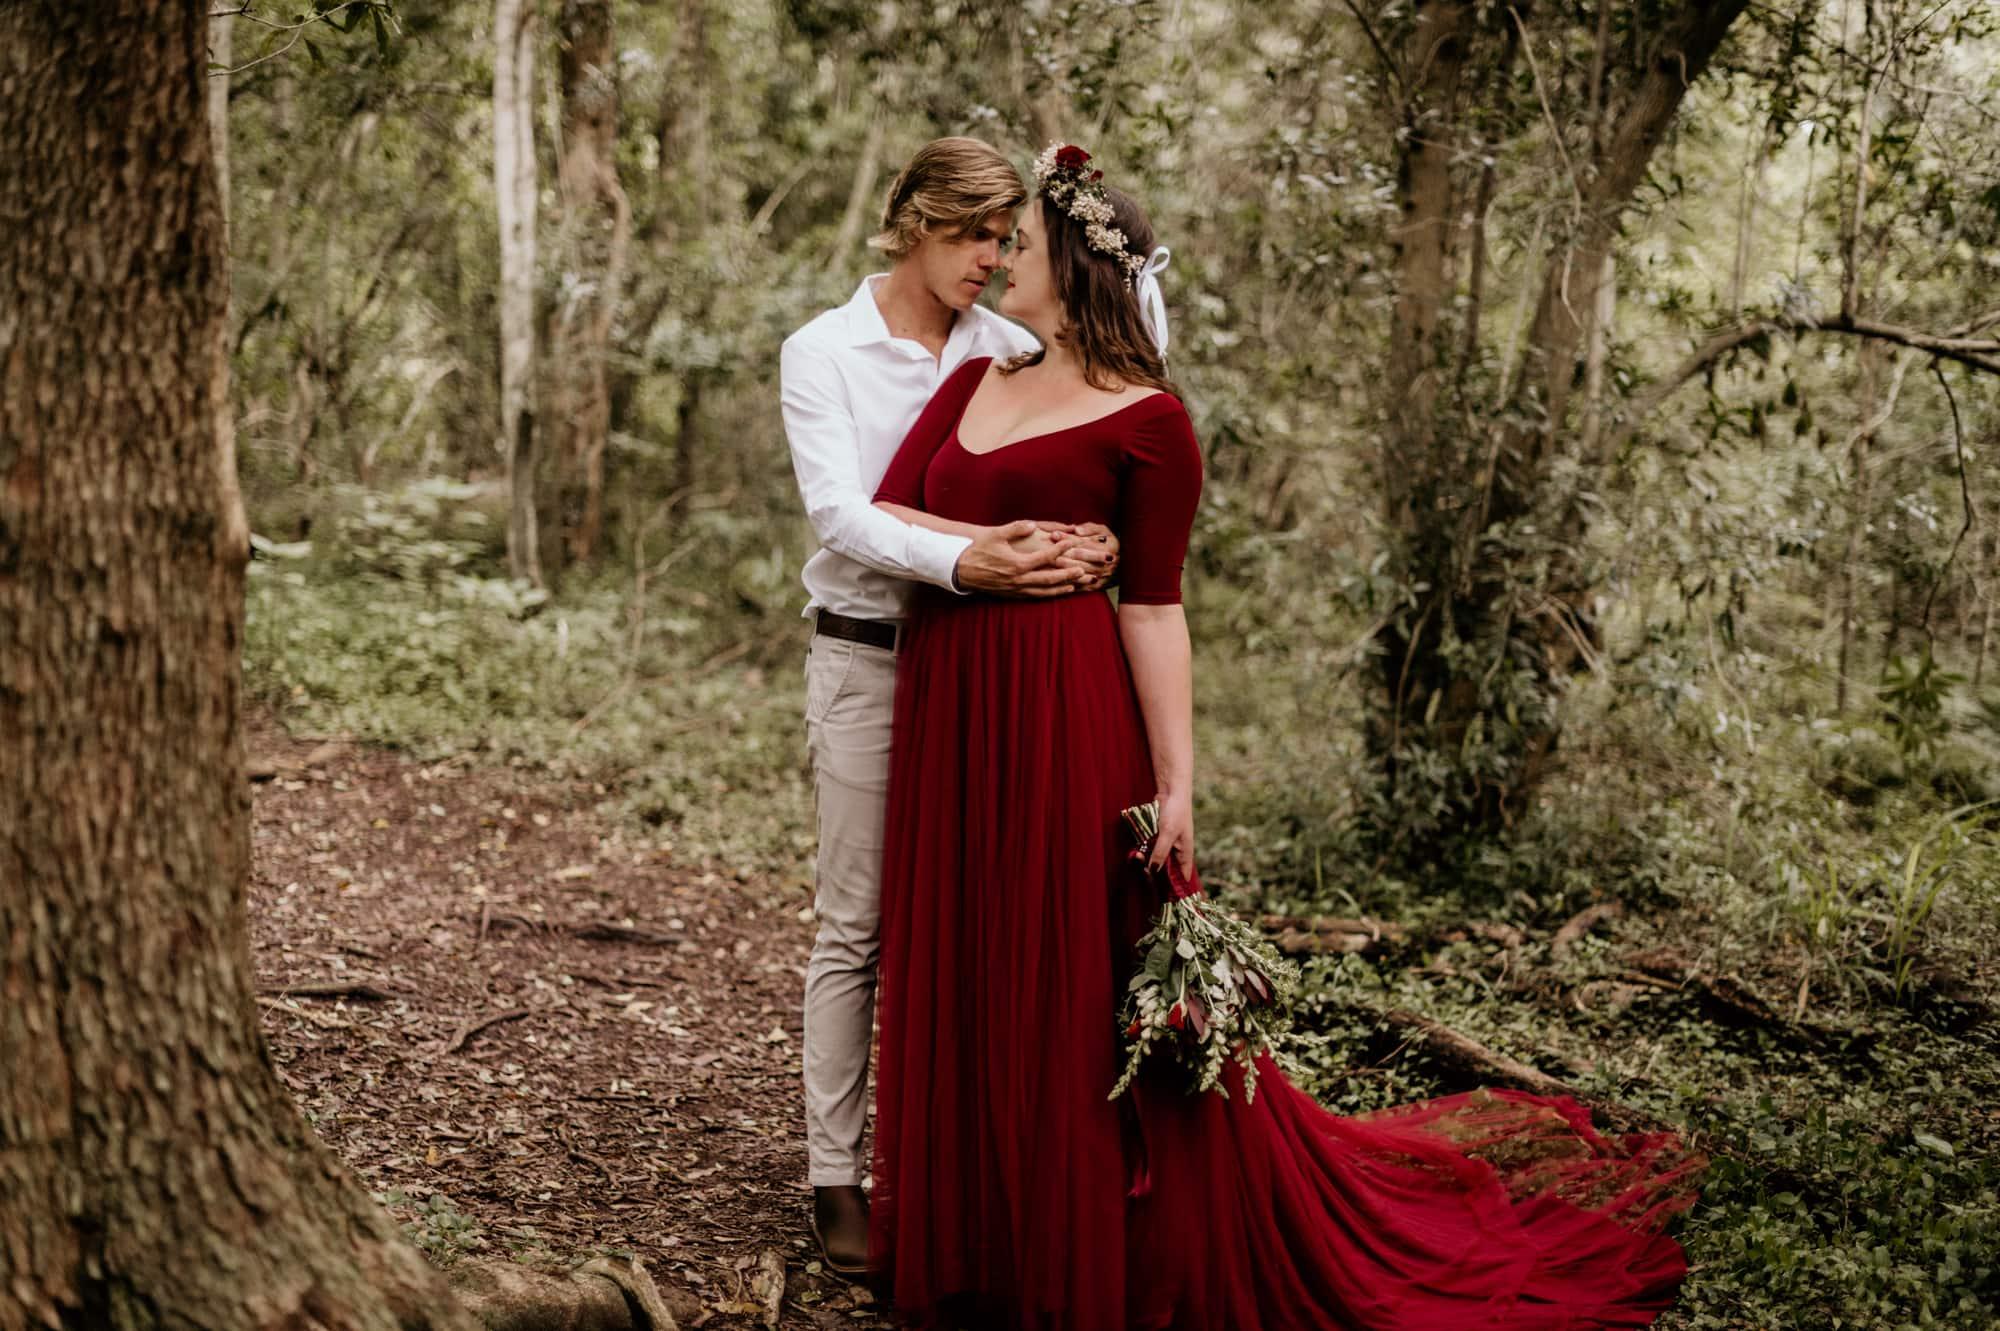 wesley-lanie-george-fernridge-engagement-June-Richards-Photography-Destination-Weddings-Elopements-Garden-Route-29